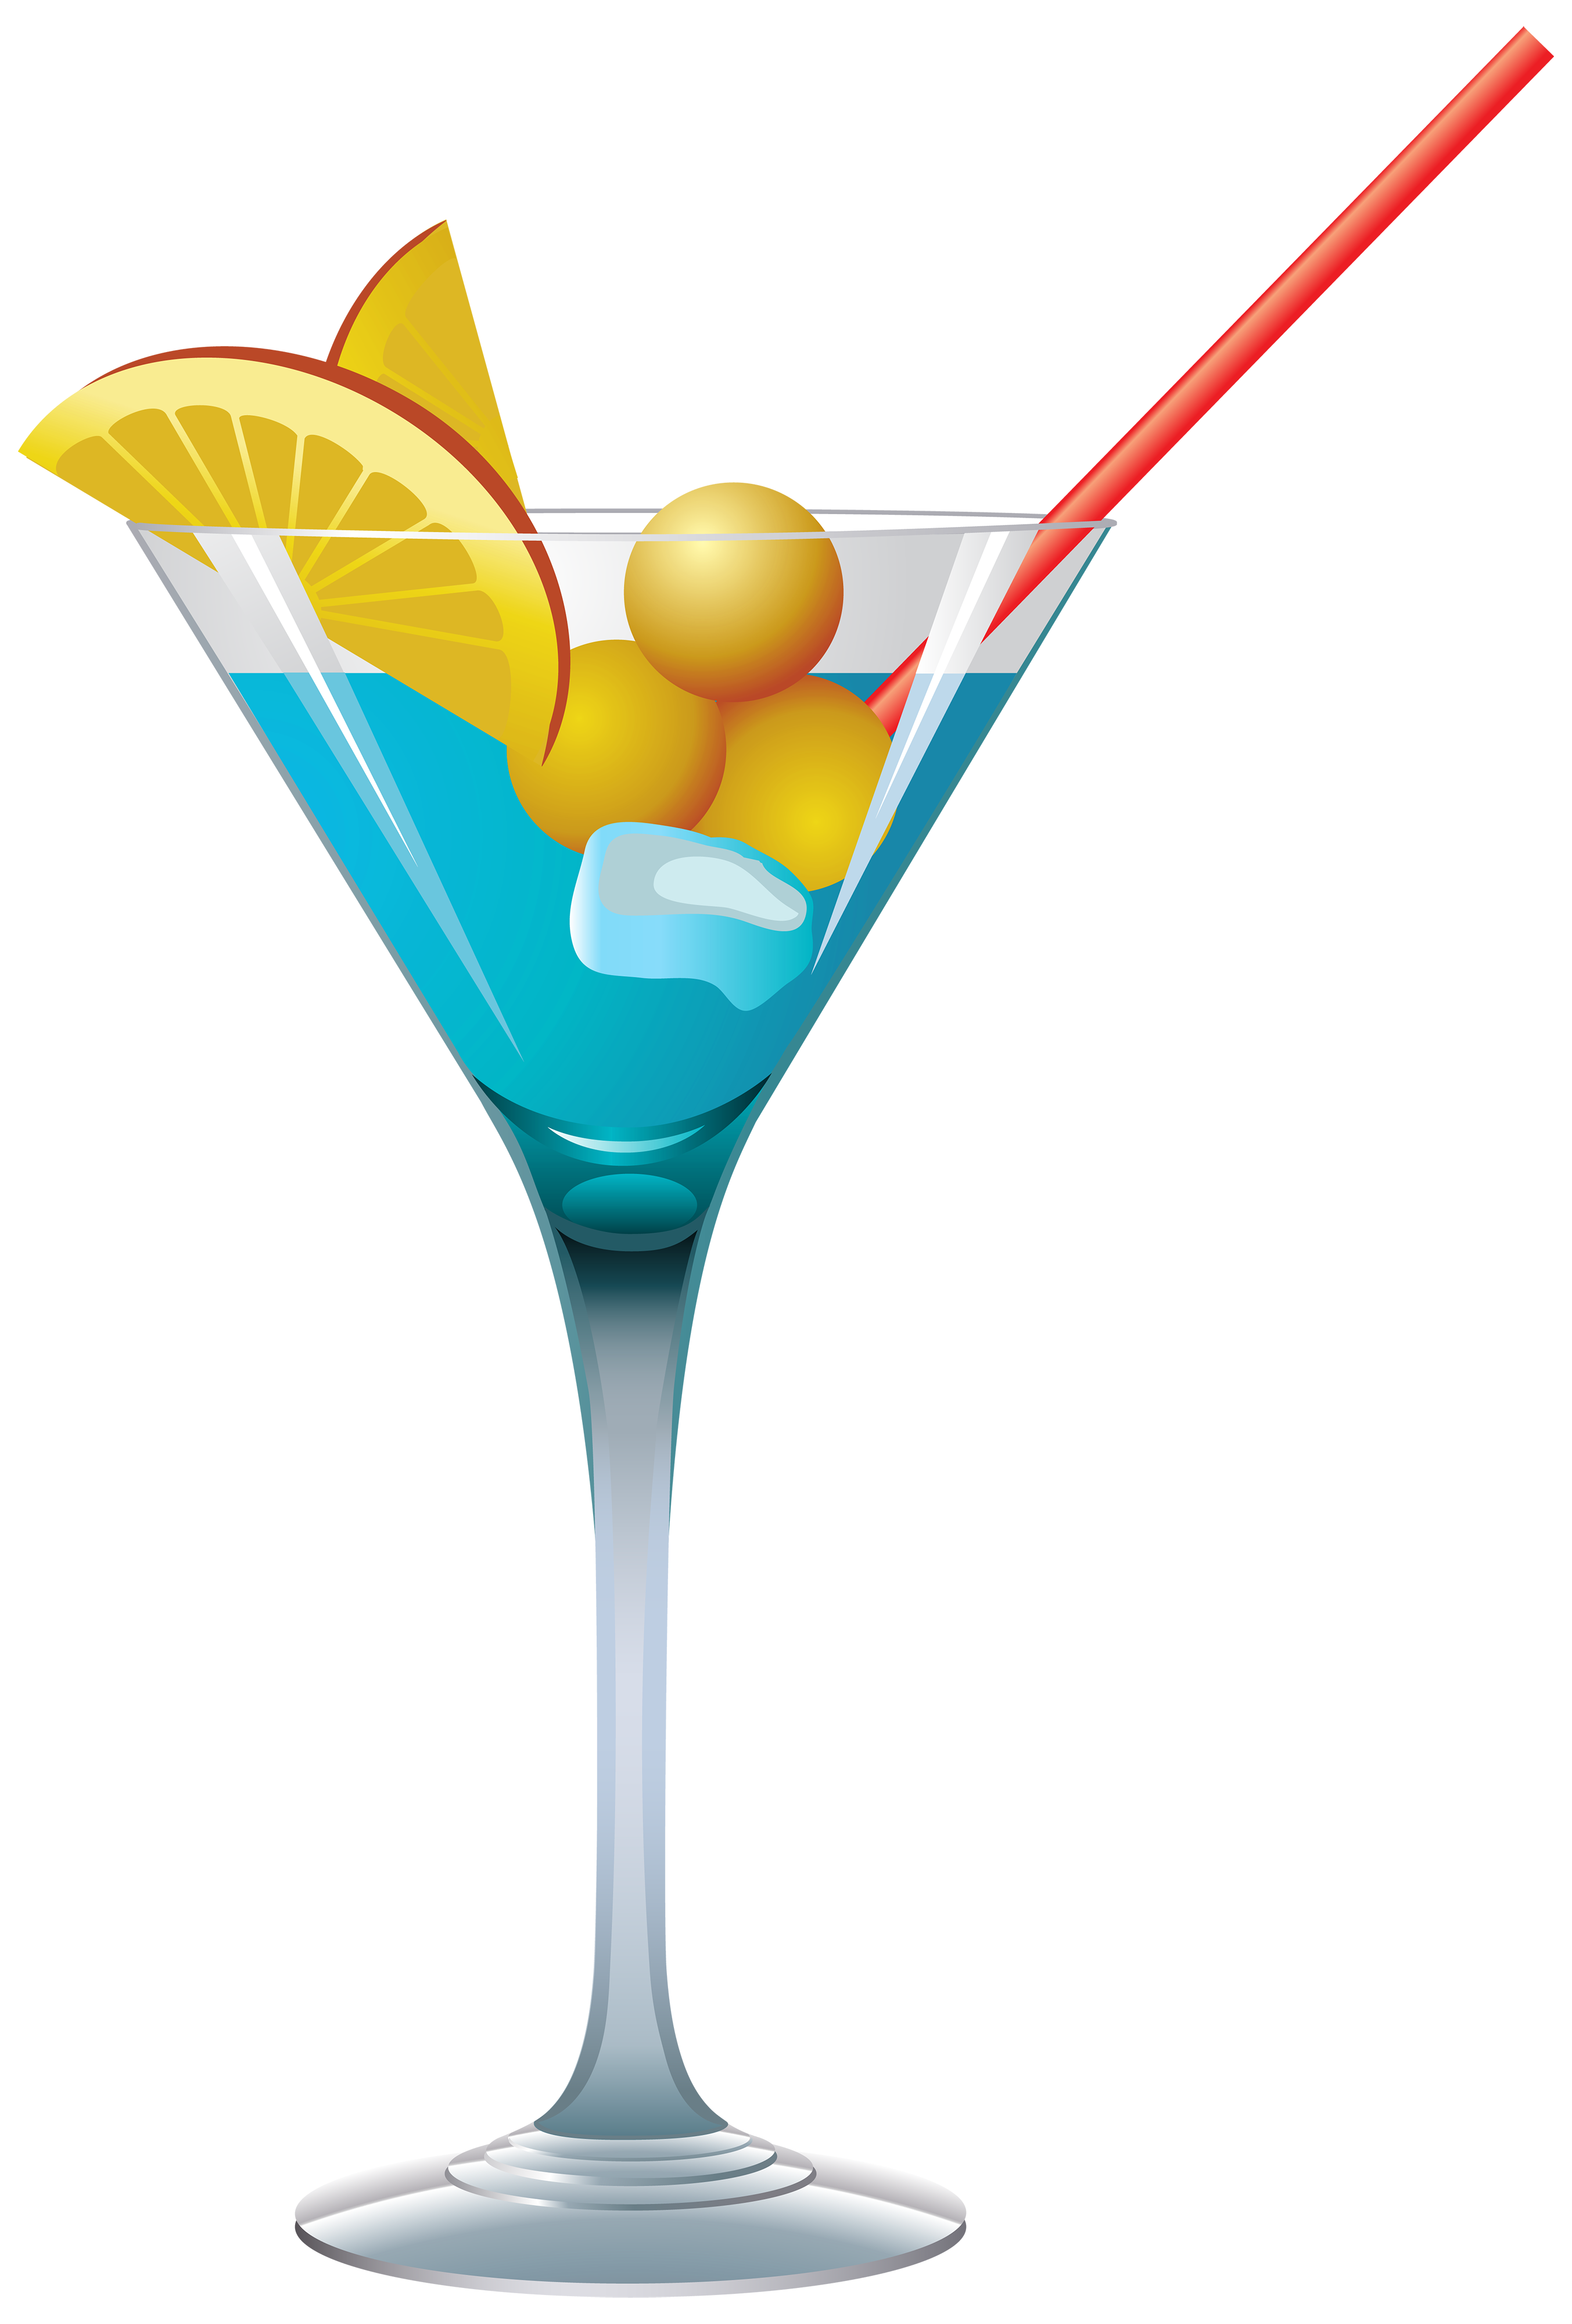 Cocktail png romolagarai org. Cocktails clipart group